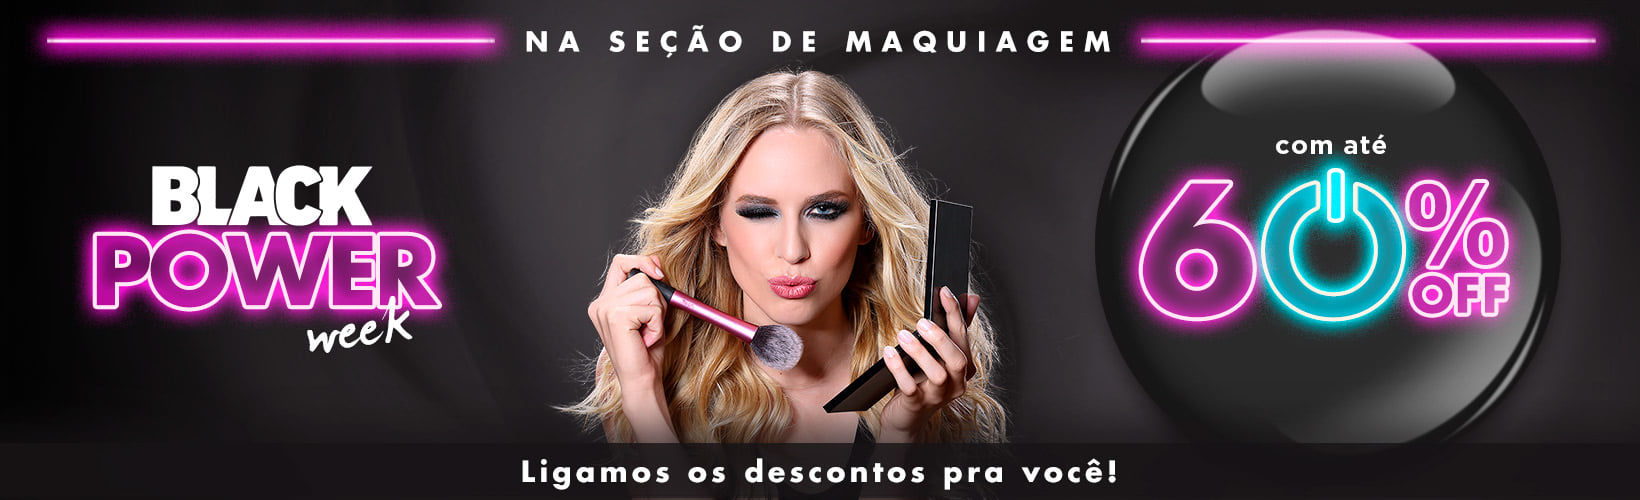 Black Friday Maquiagem